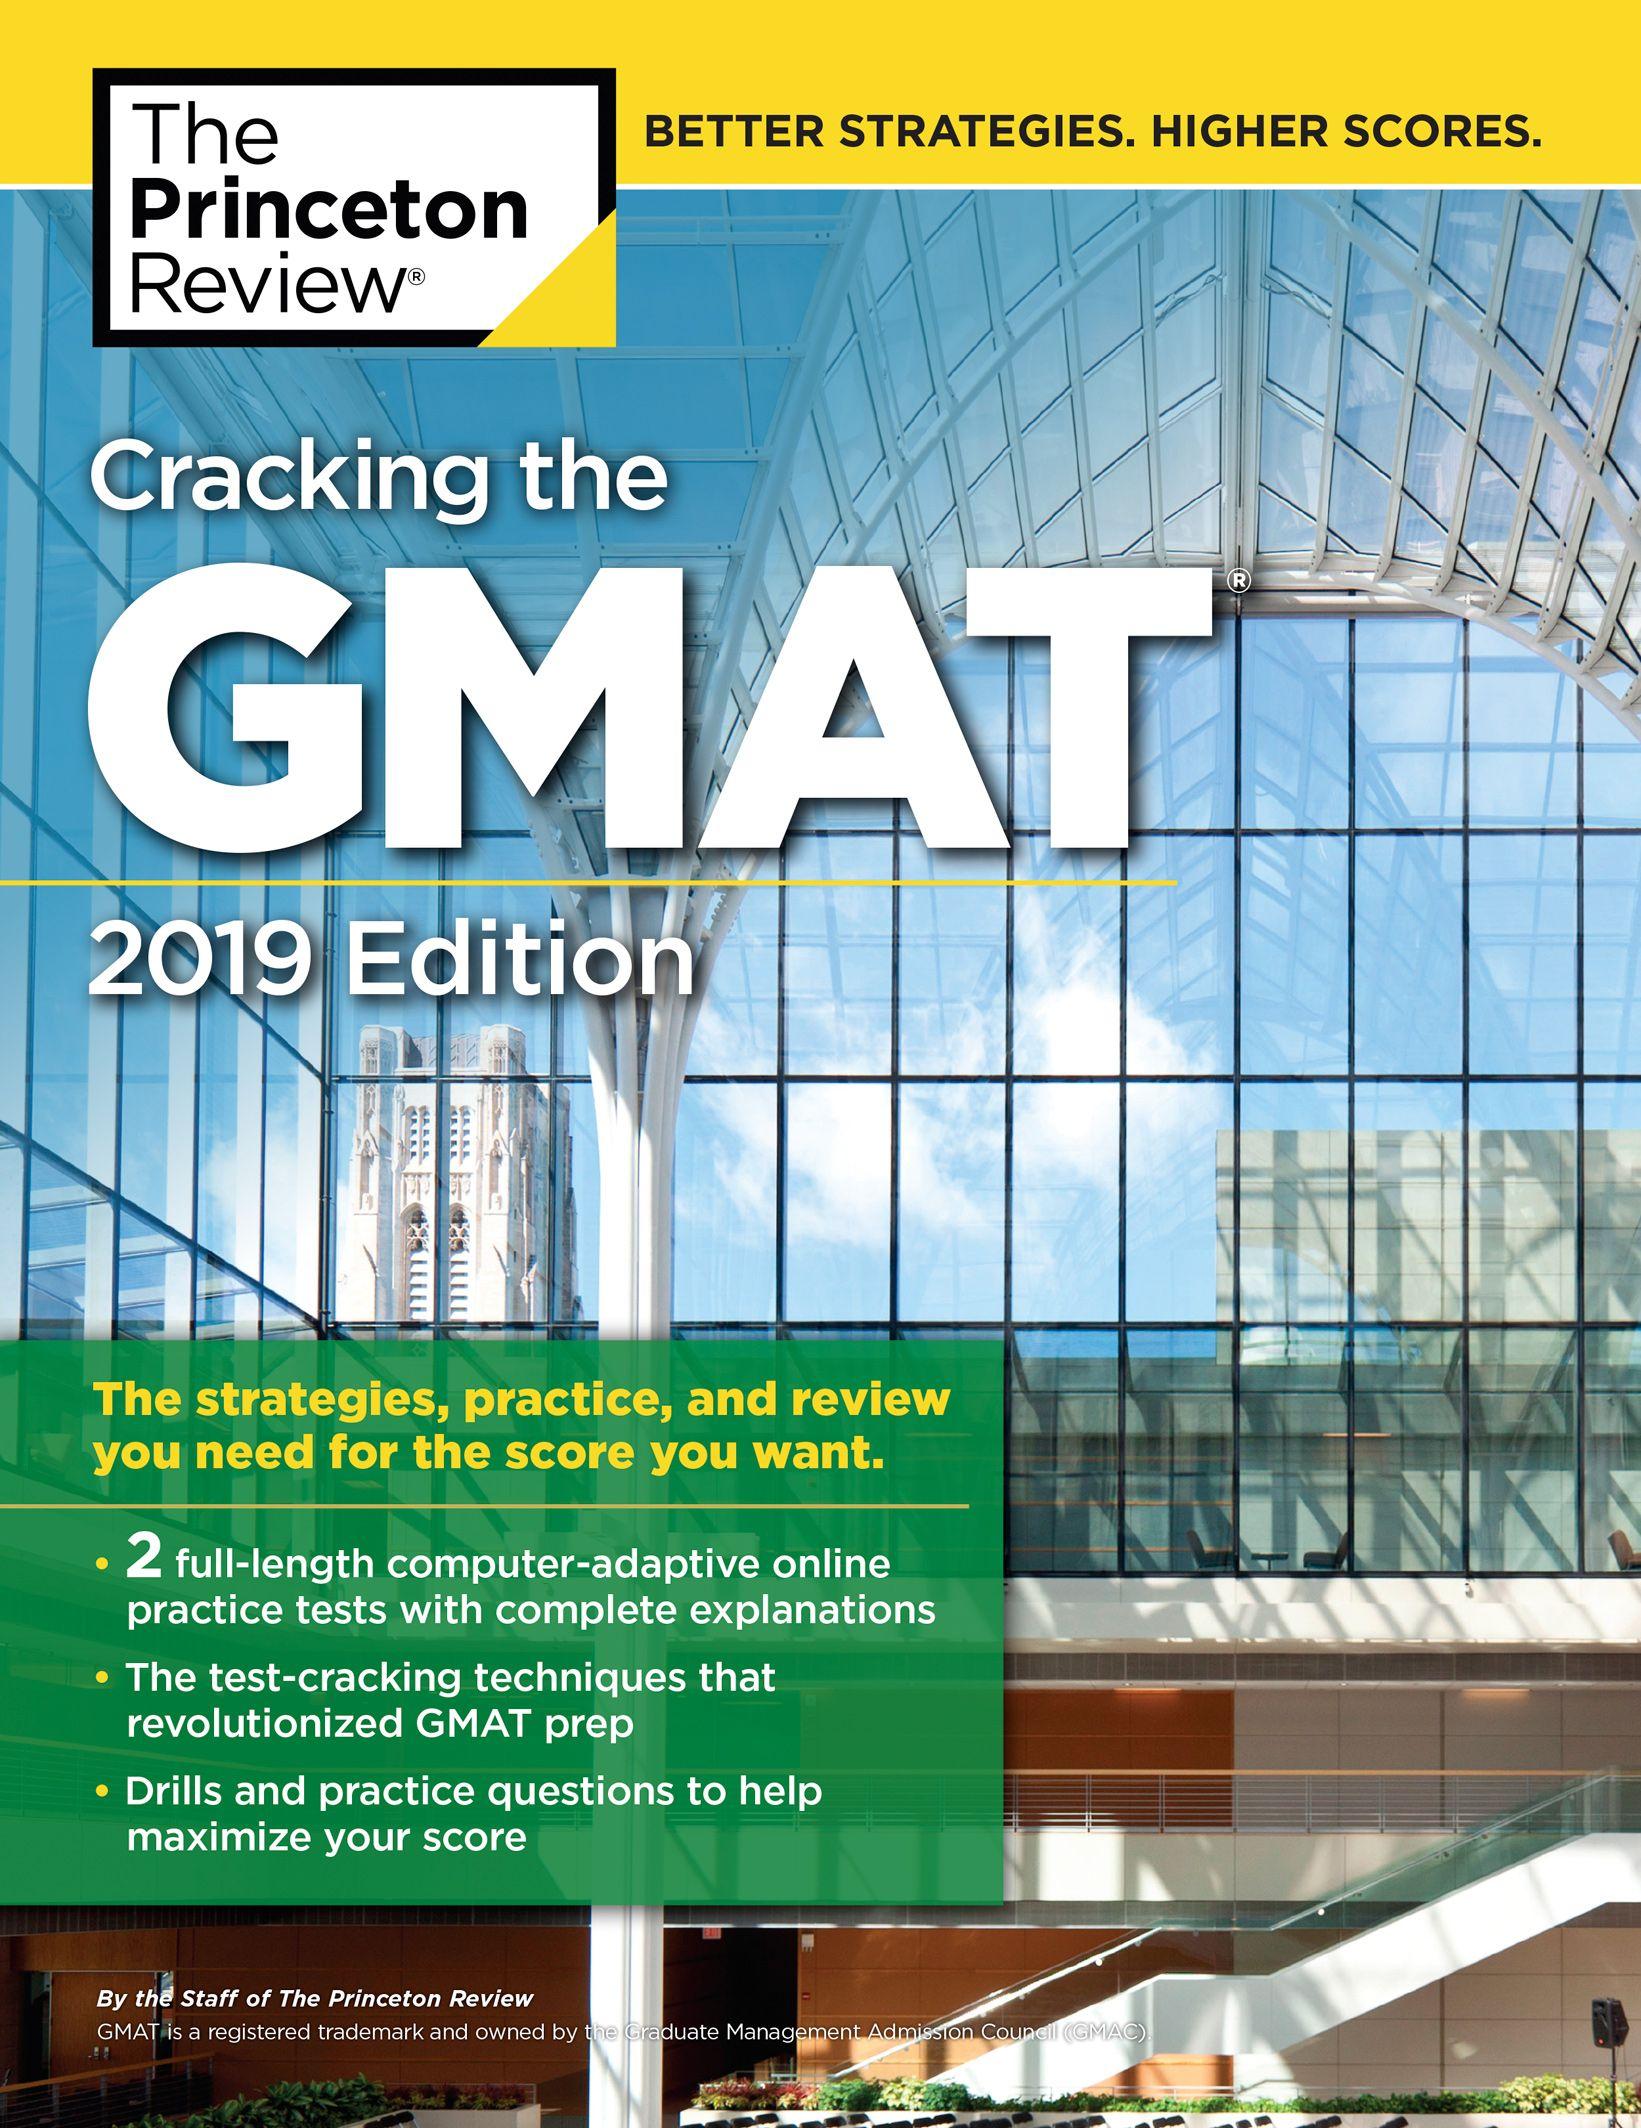 The pdf gmat cracking review princeton